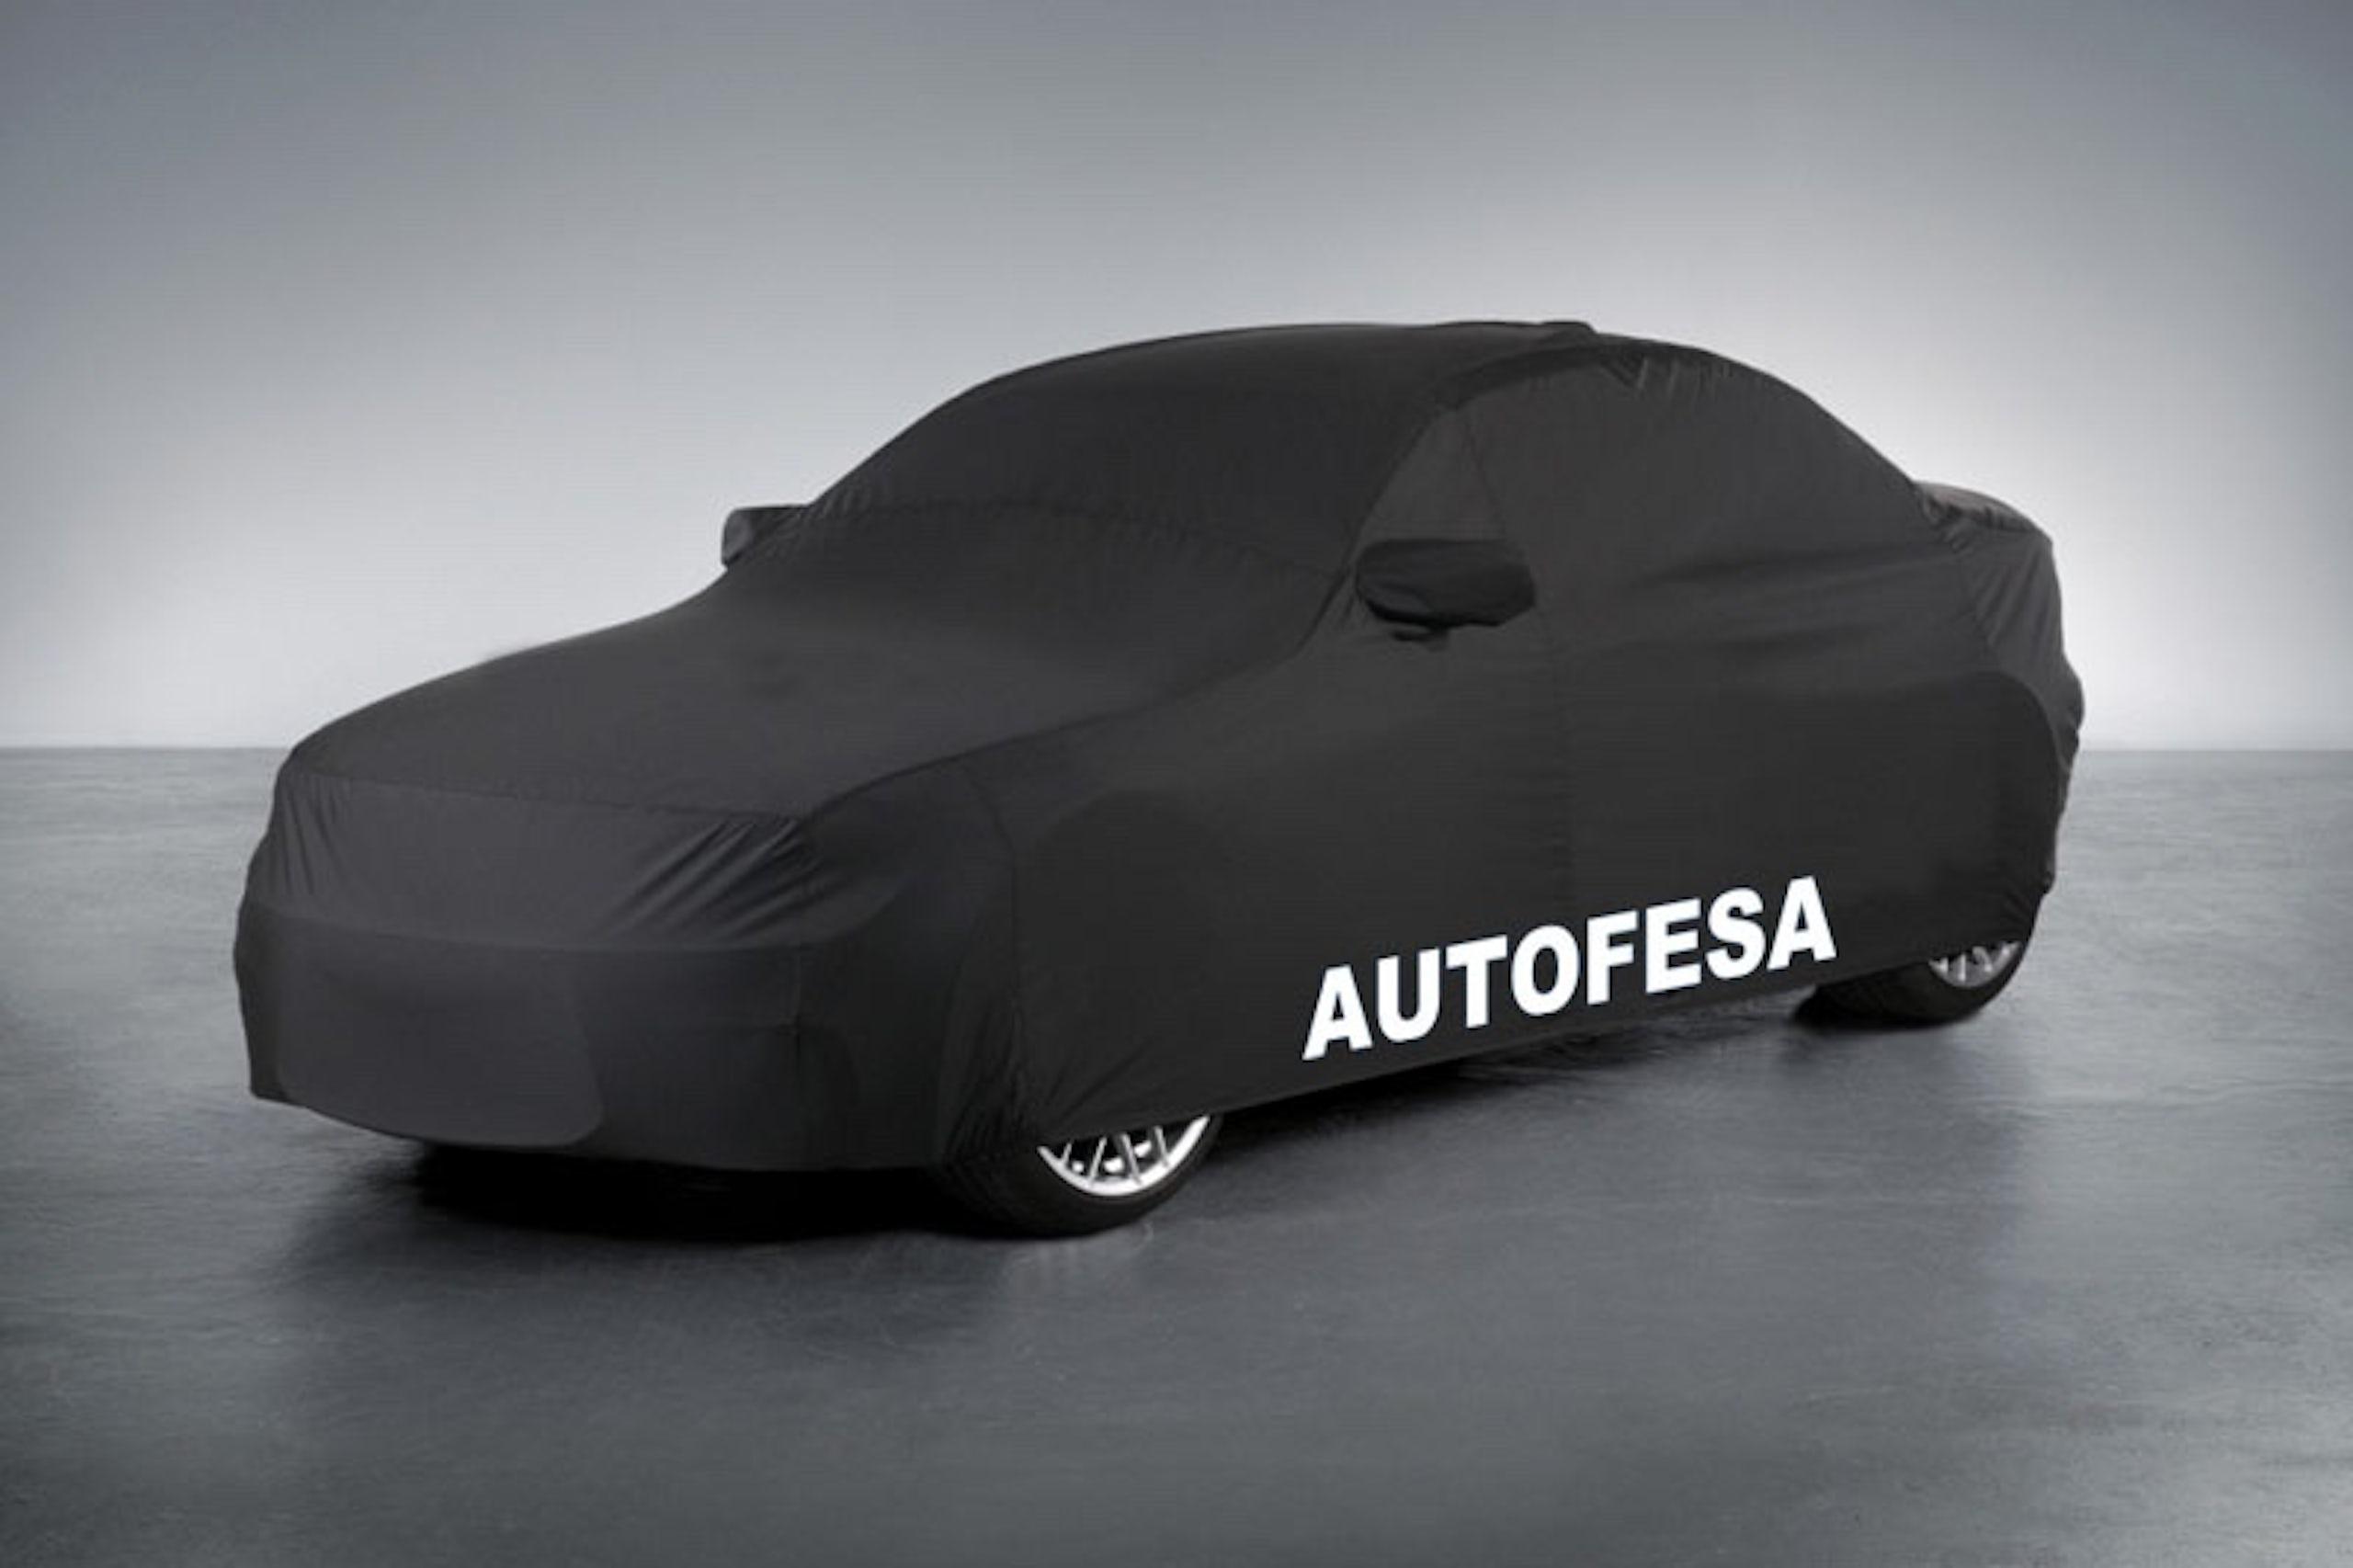 Volvo Xc 60 2.0 T8 Twin Momentum Hybrido Enchufable AWD Auto 407cv 5p S/S - Foto 36